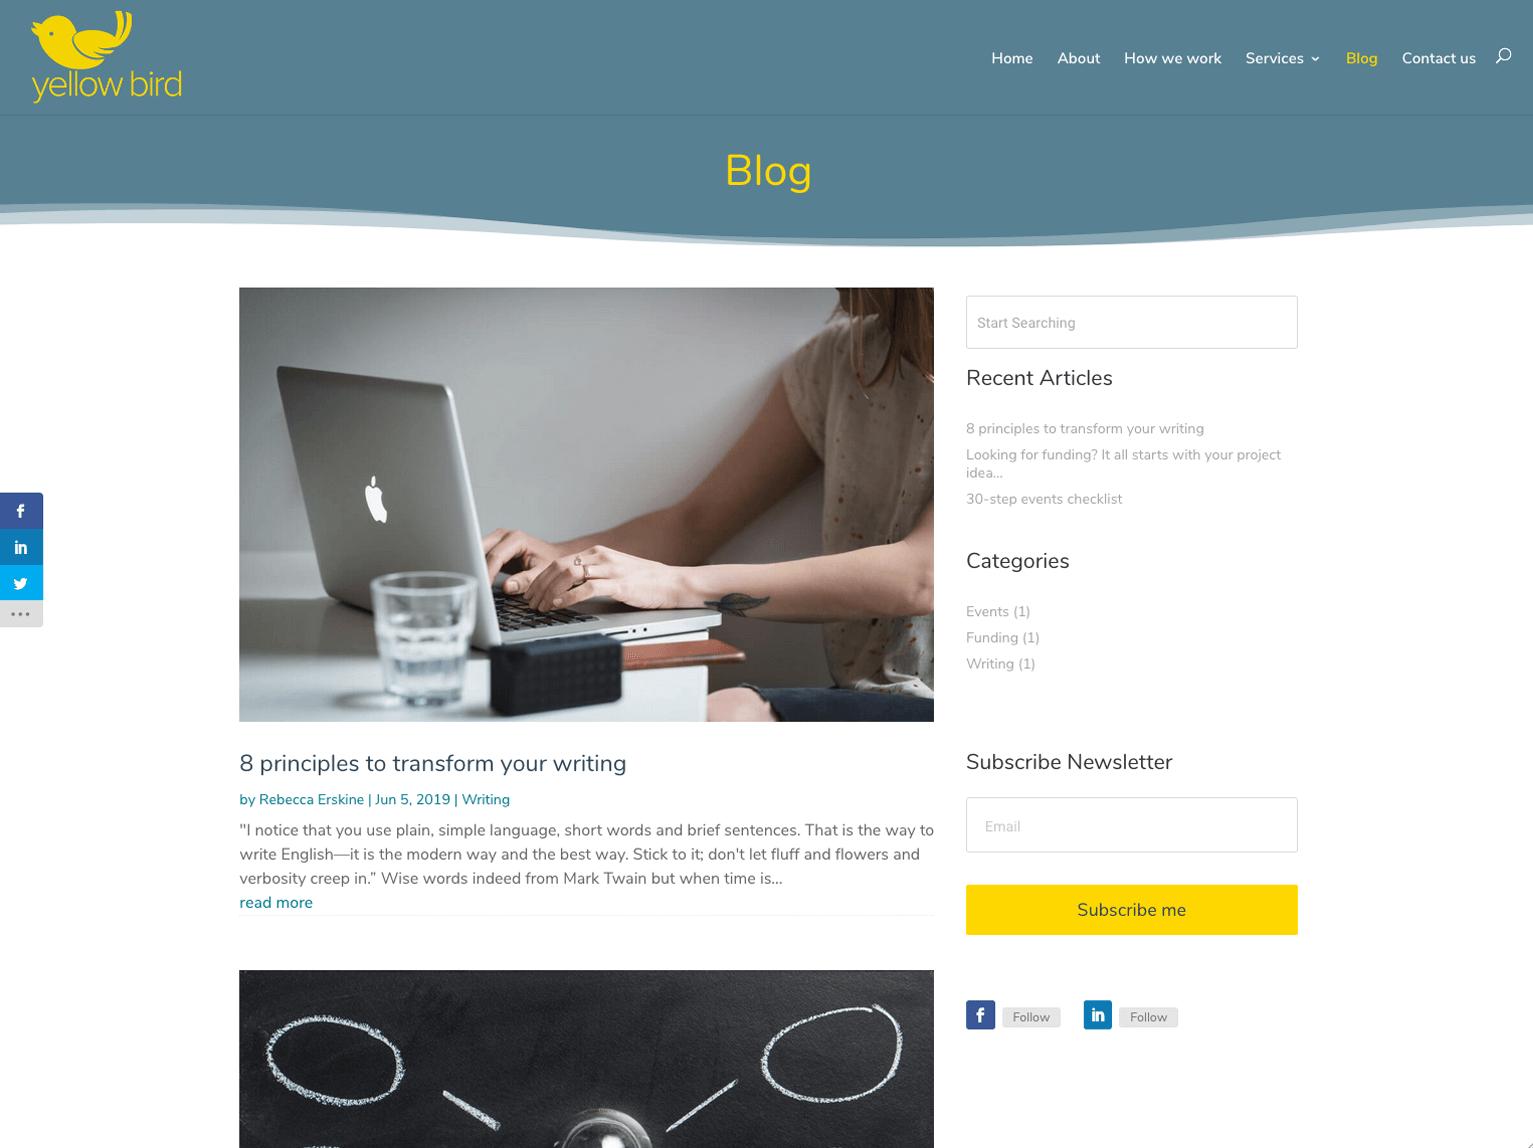 Yellow Bird Marketing and Communications Blog